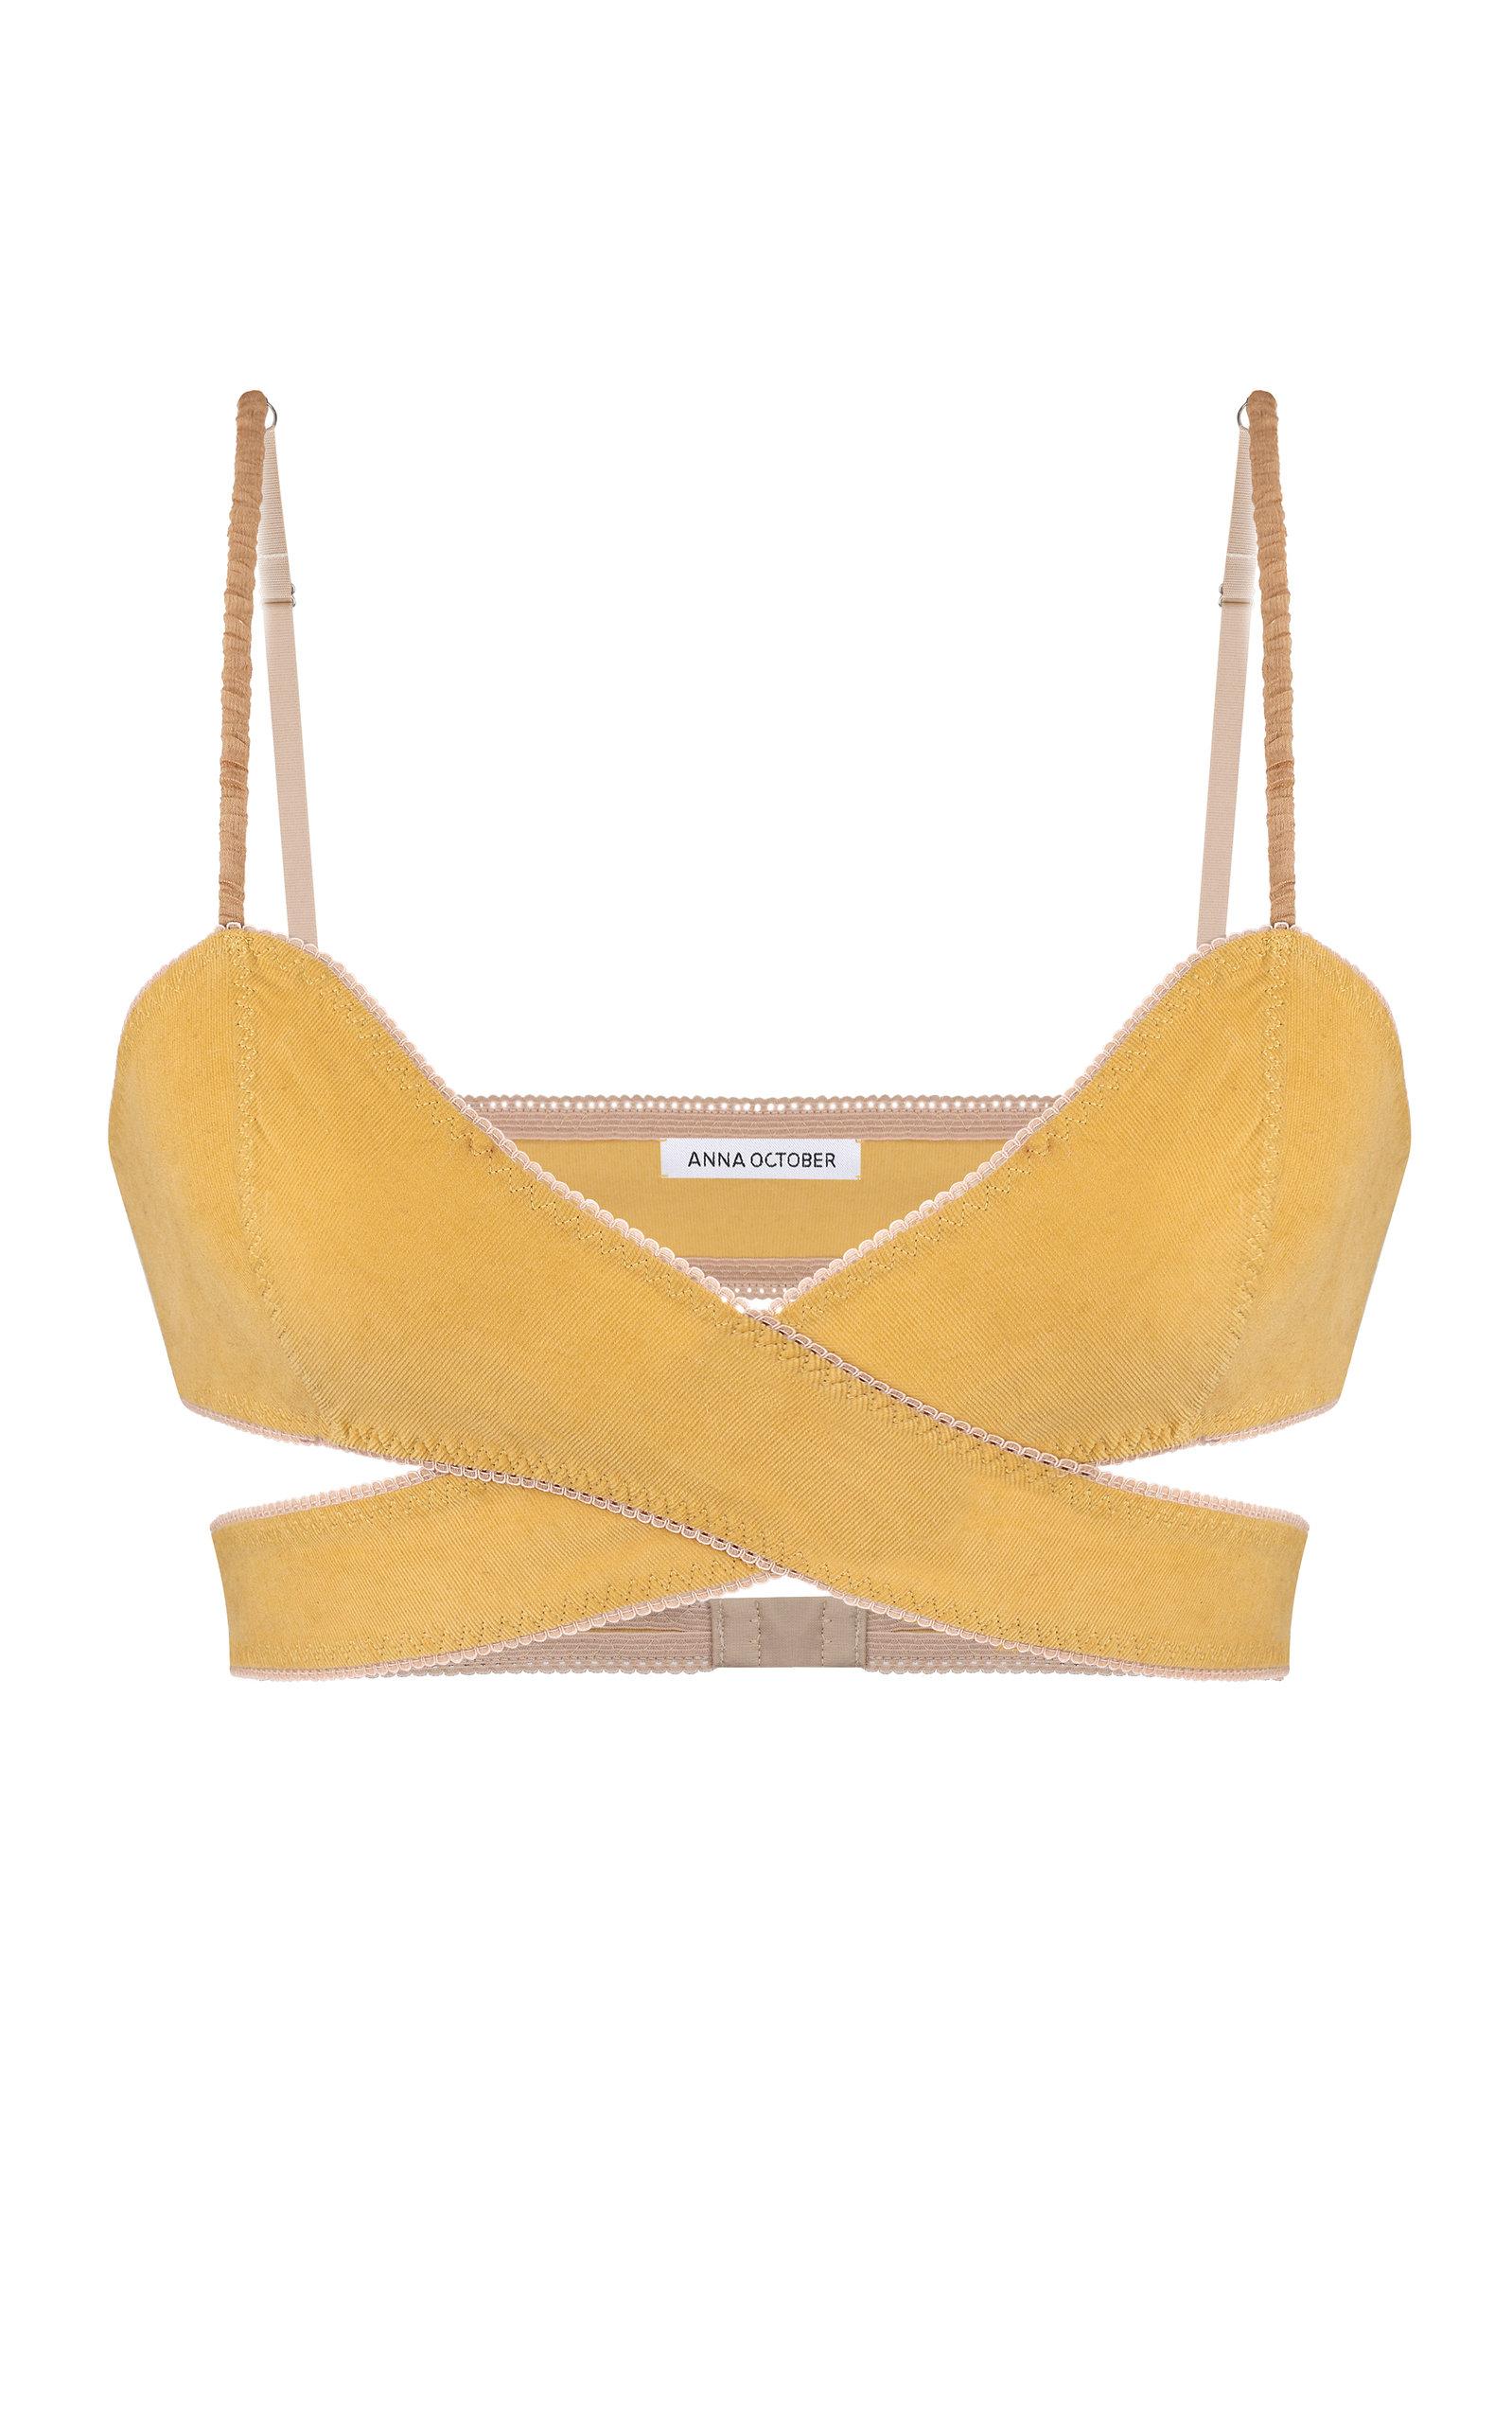 Women's Alice Criss-Cross Cotton Bra Top